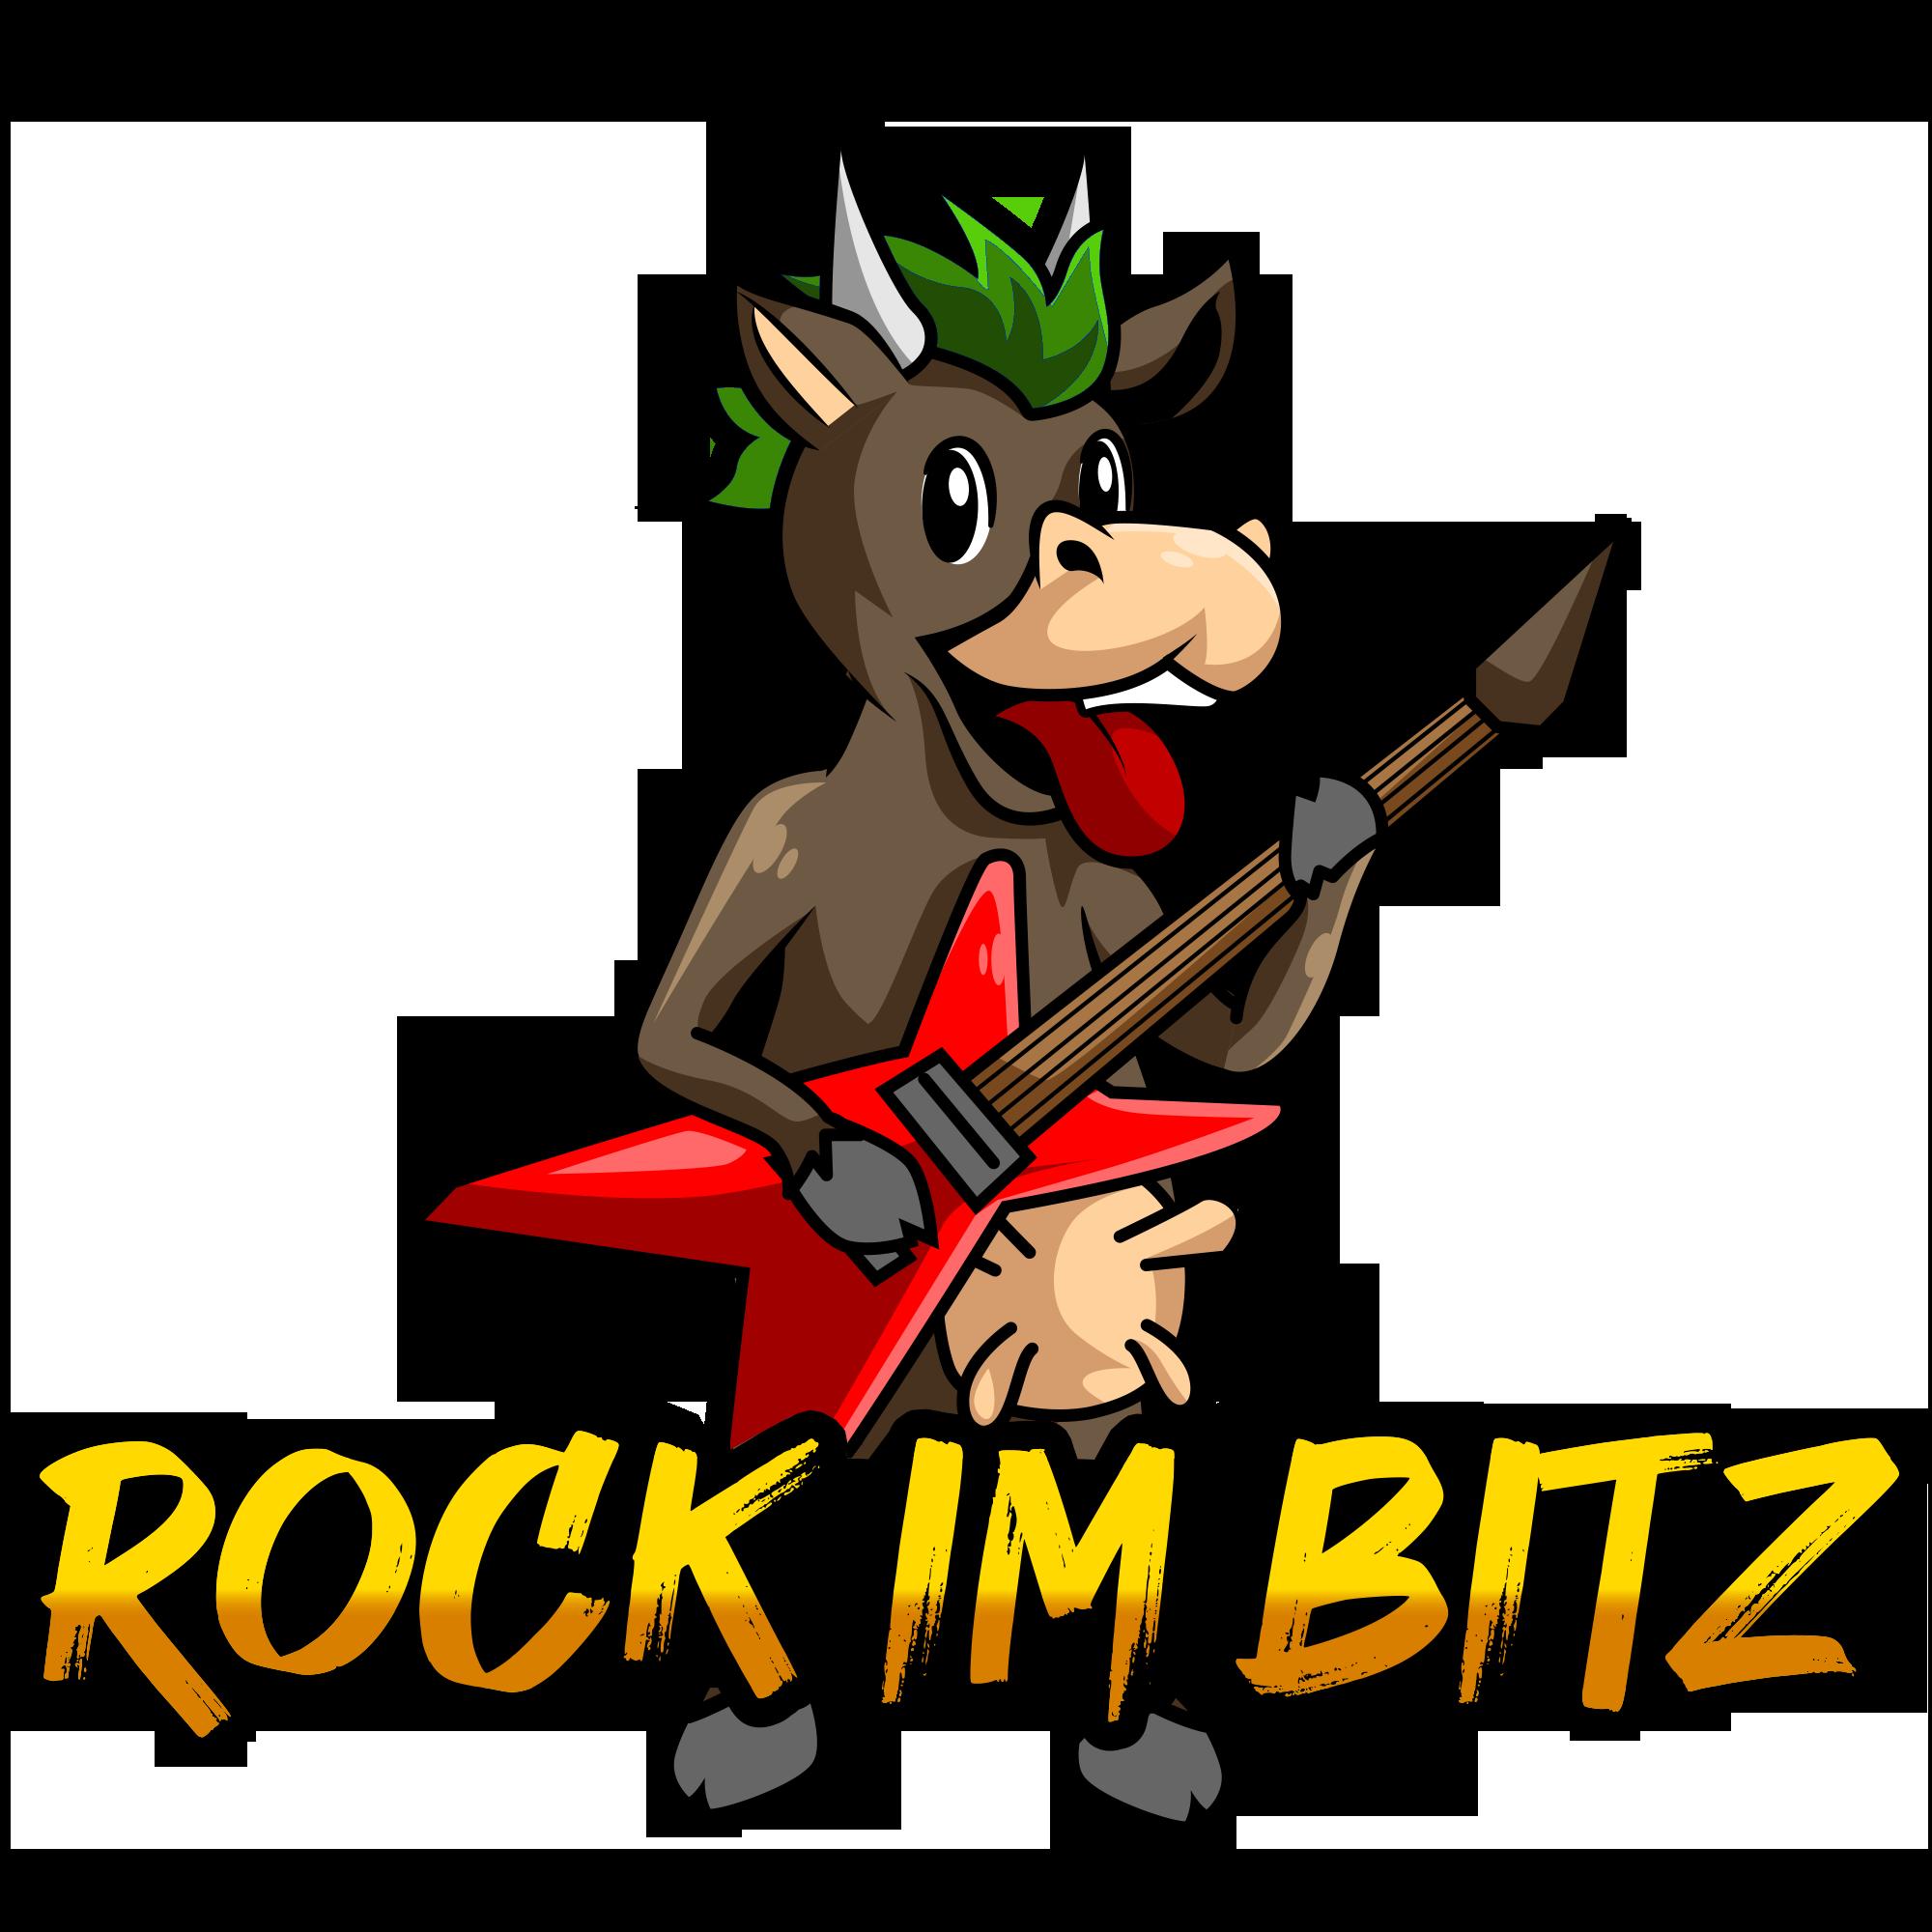 Rock im Bitz_Logo_2